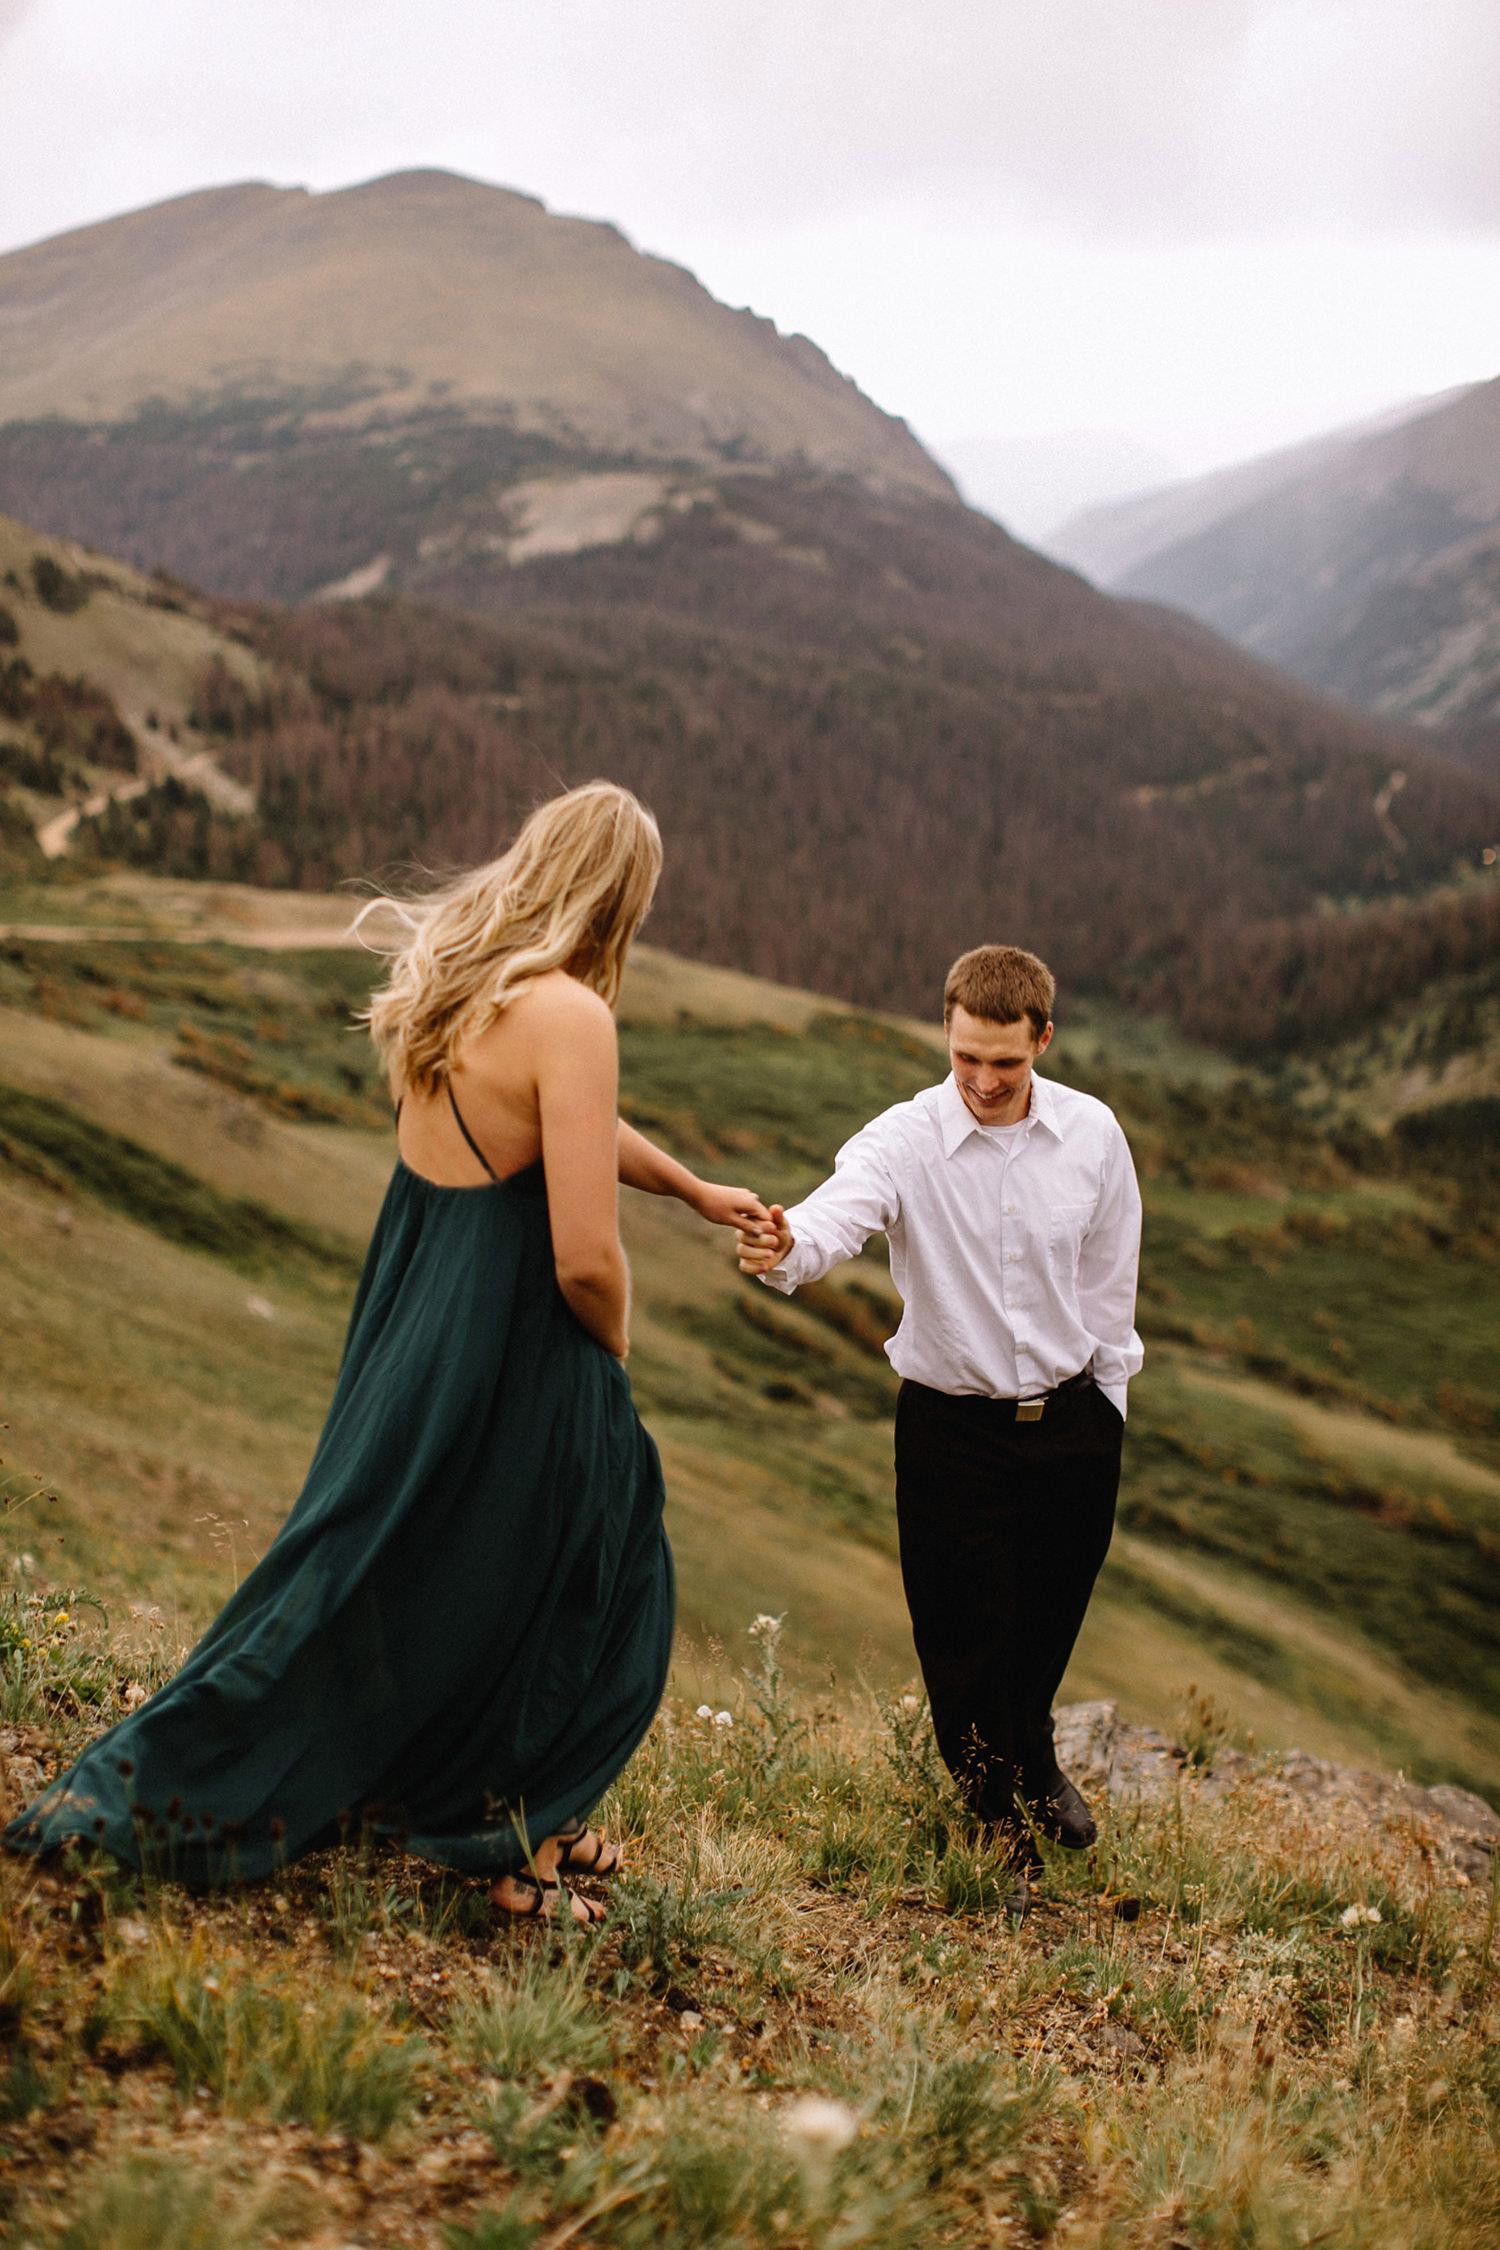 Rocky Mountain Engagement National Park Engaged Photos Wedding Elopement Portrait Mountains Trail Ridge Rd Peak Alpine Dress Lulus Rules Permit Photo Adventure Love Couples Destination Liz Osban photography Cheyenne Wyoming23.jpg